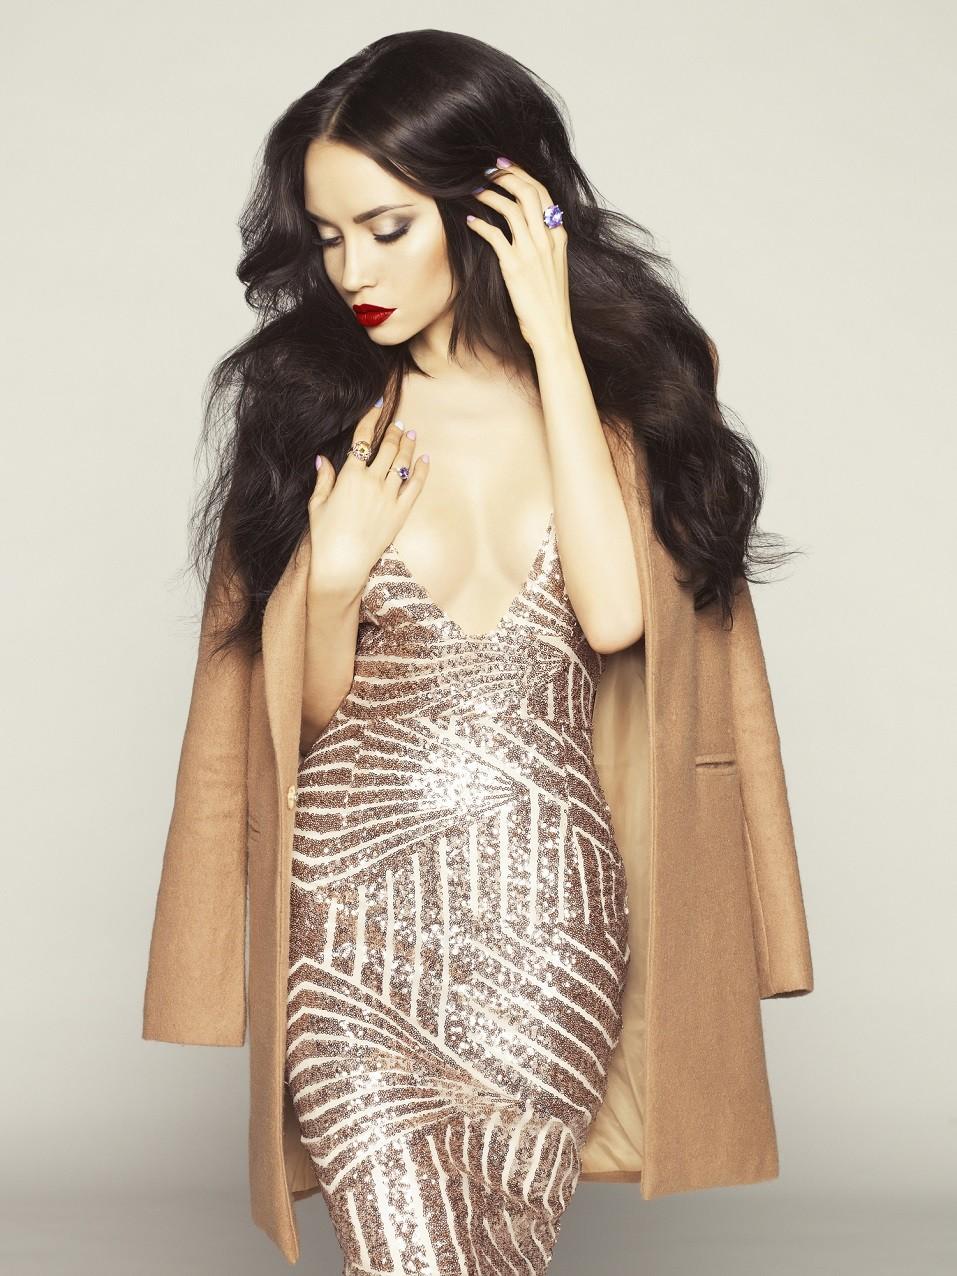 brunette model in fashion clothes posing in studio